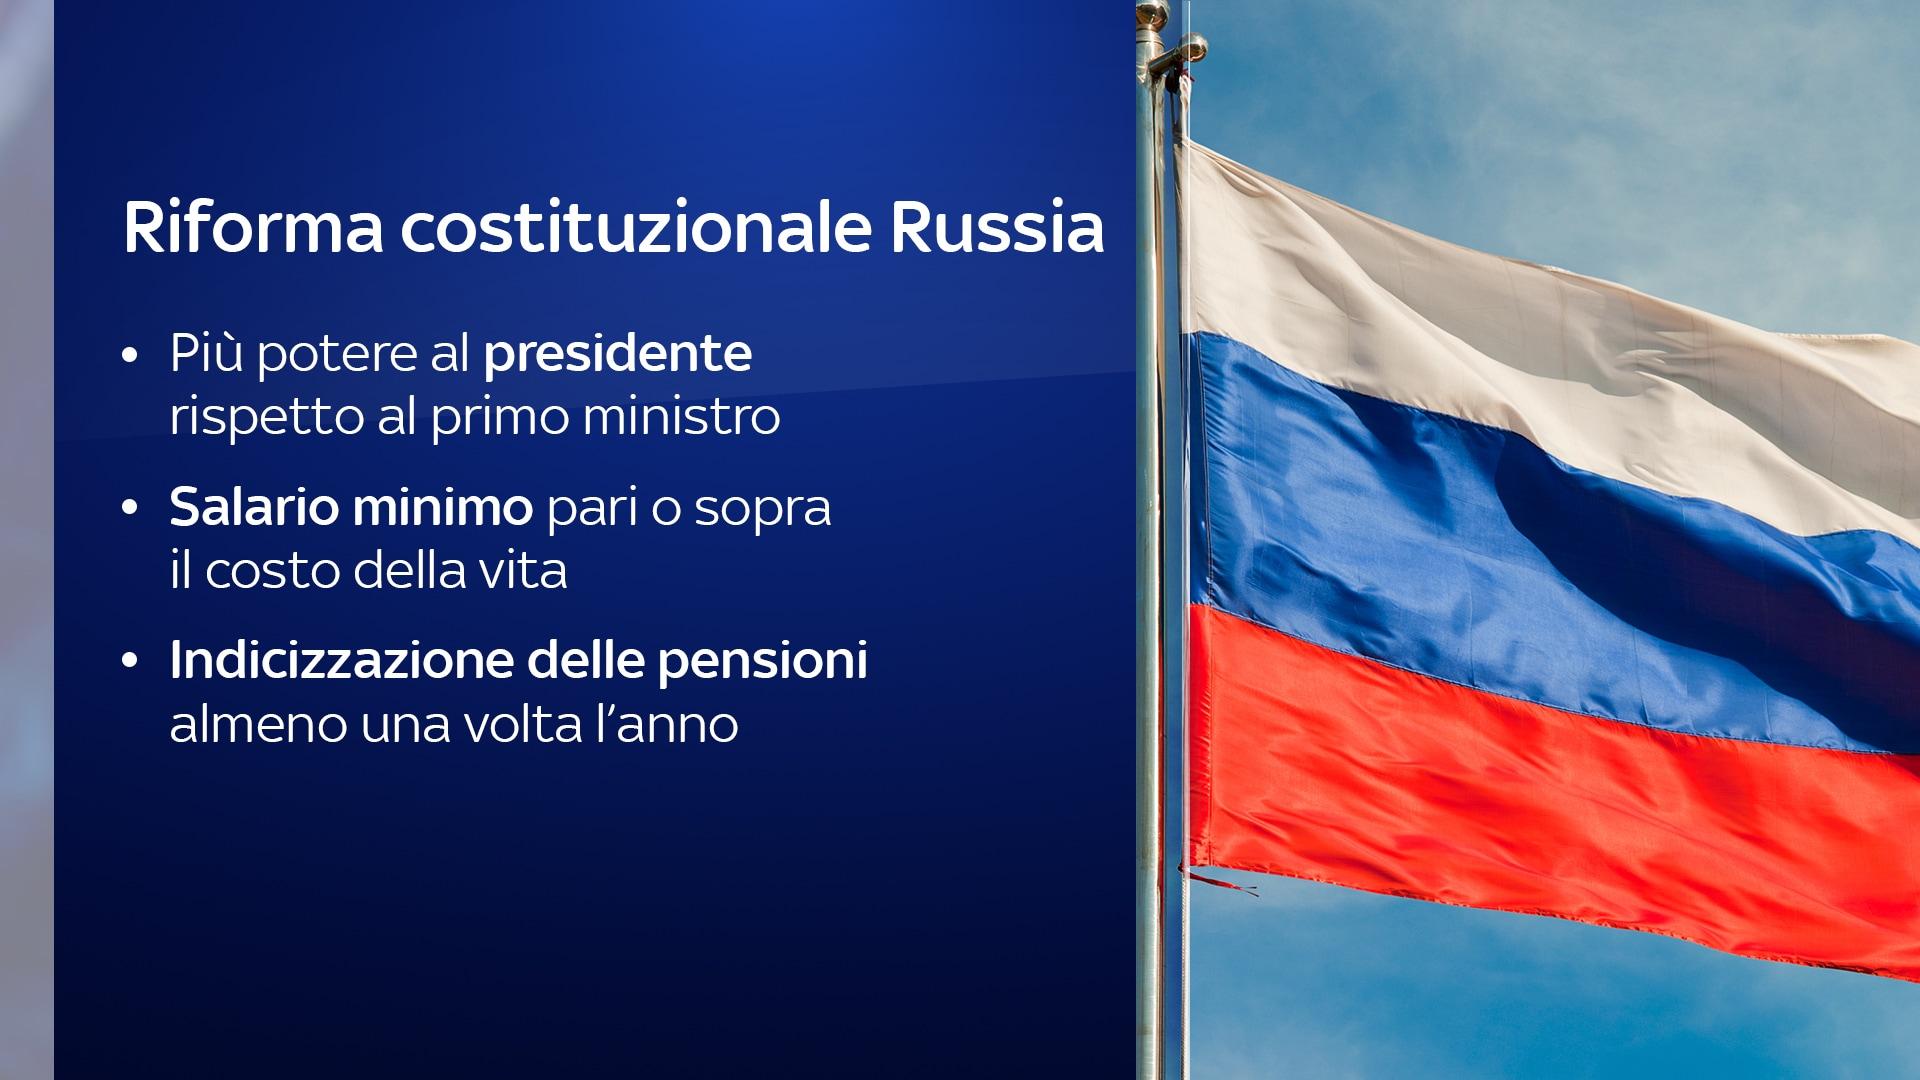 riforma costituzionale russia